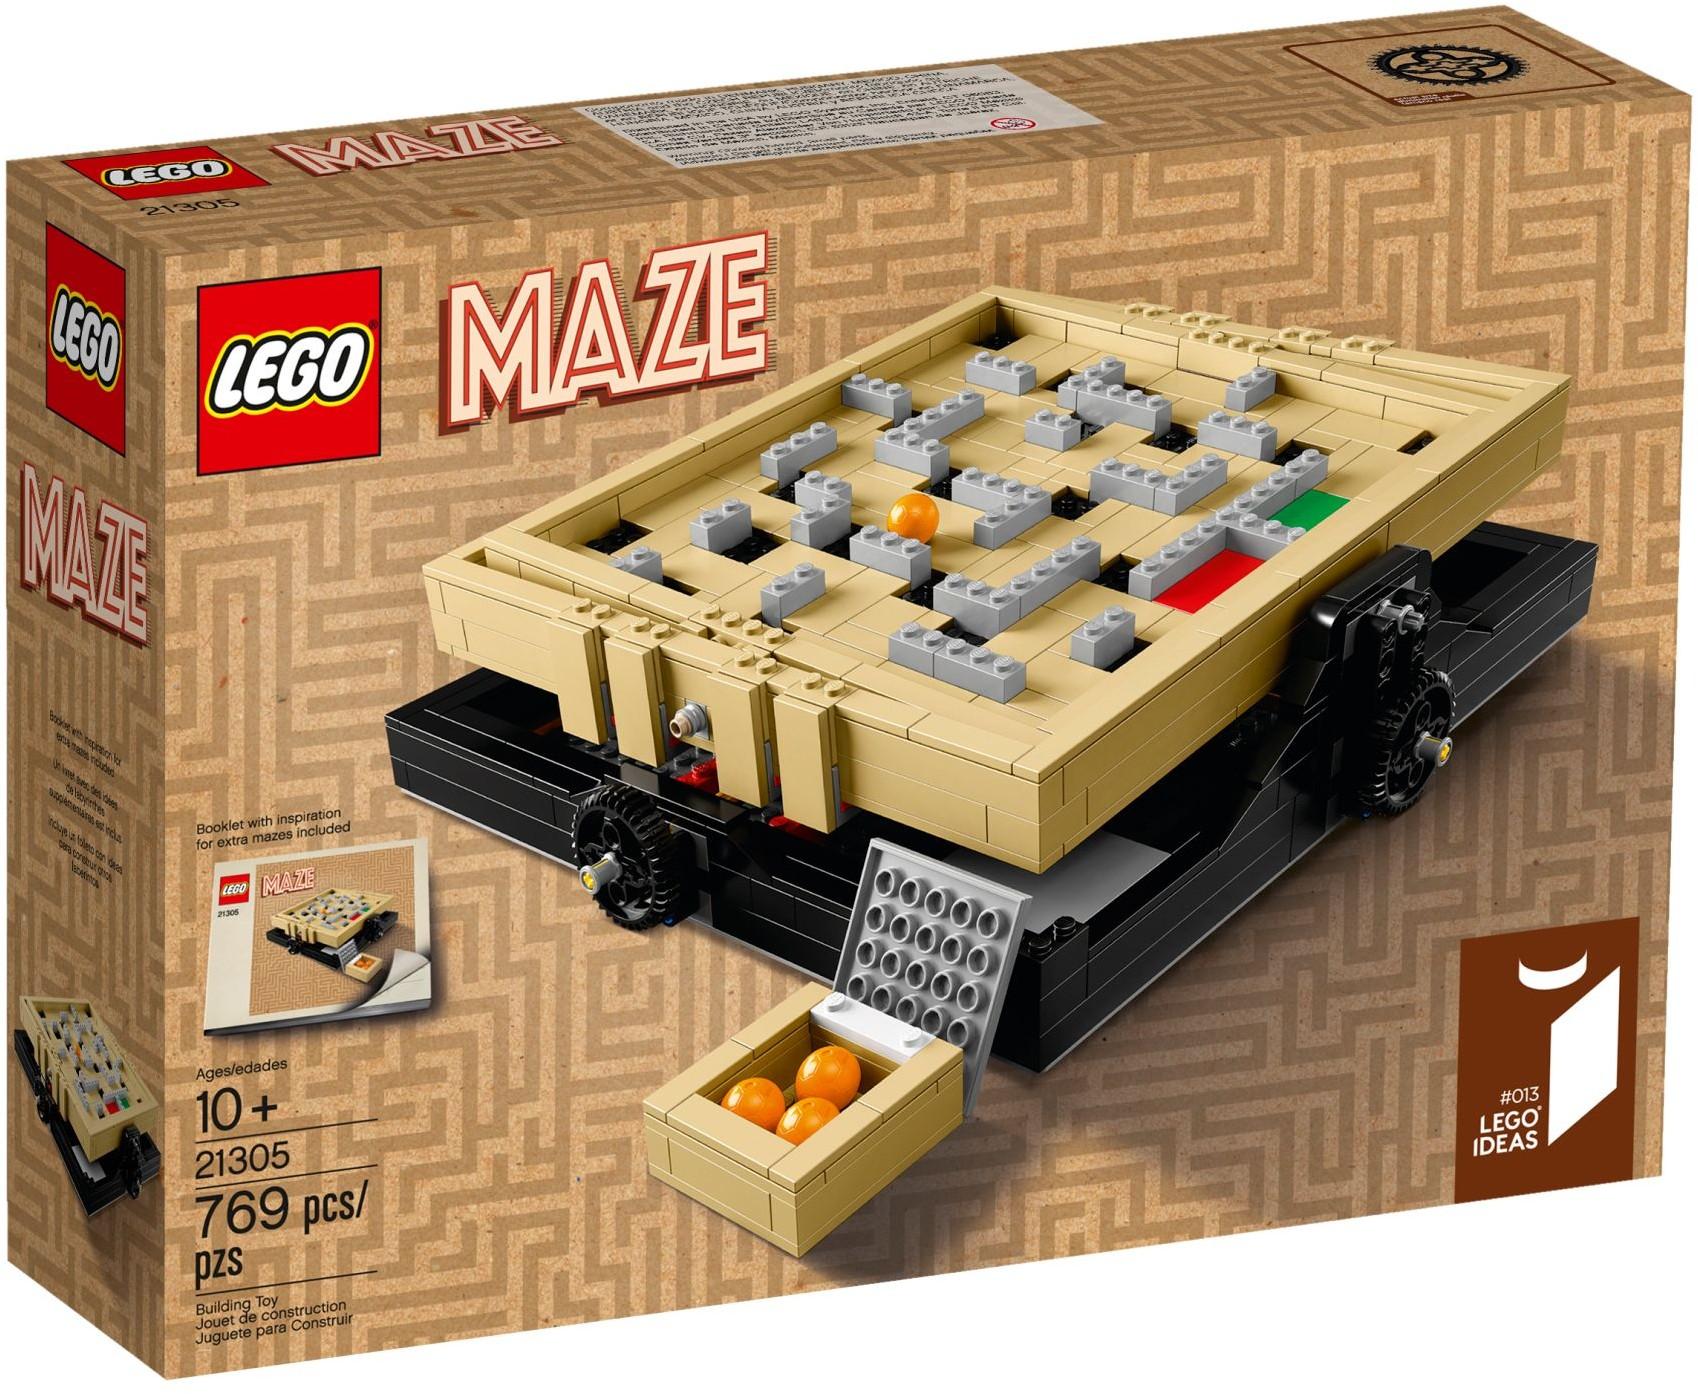 LEGO 21305 IDEAS Maze